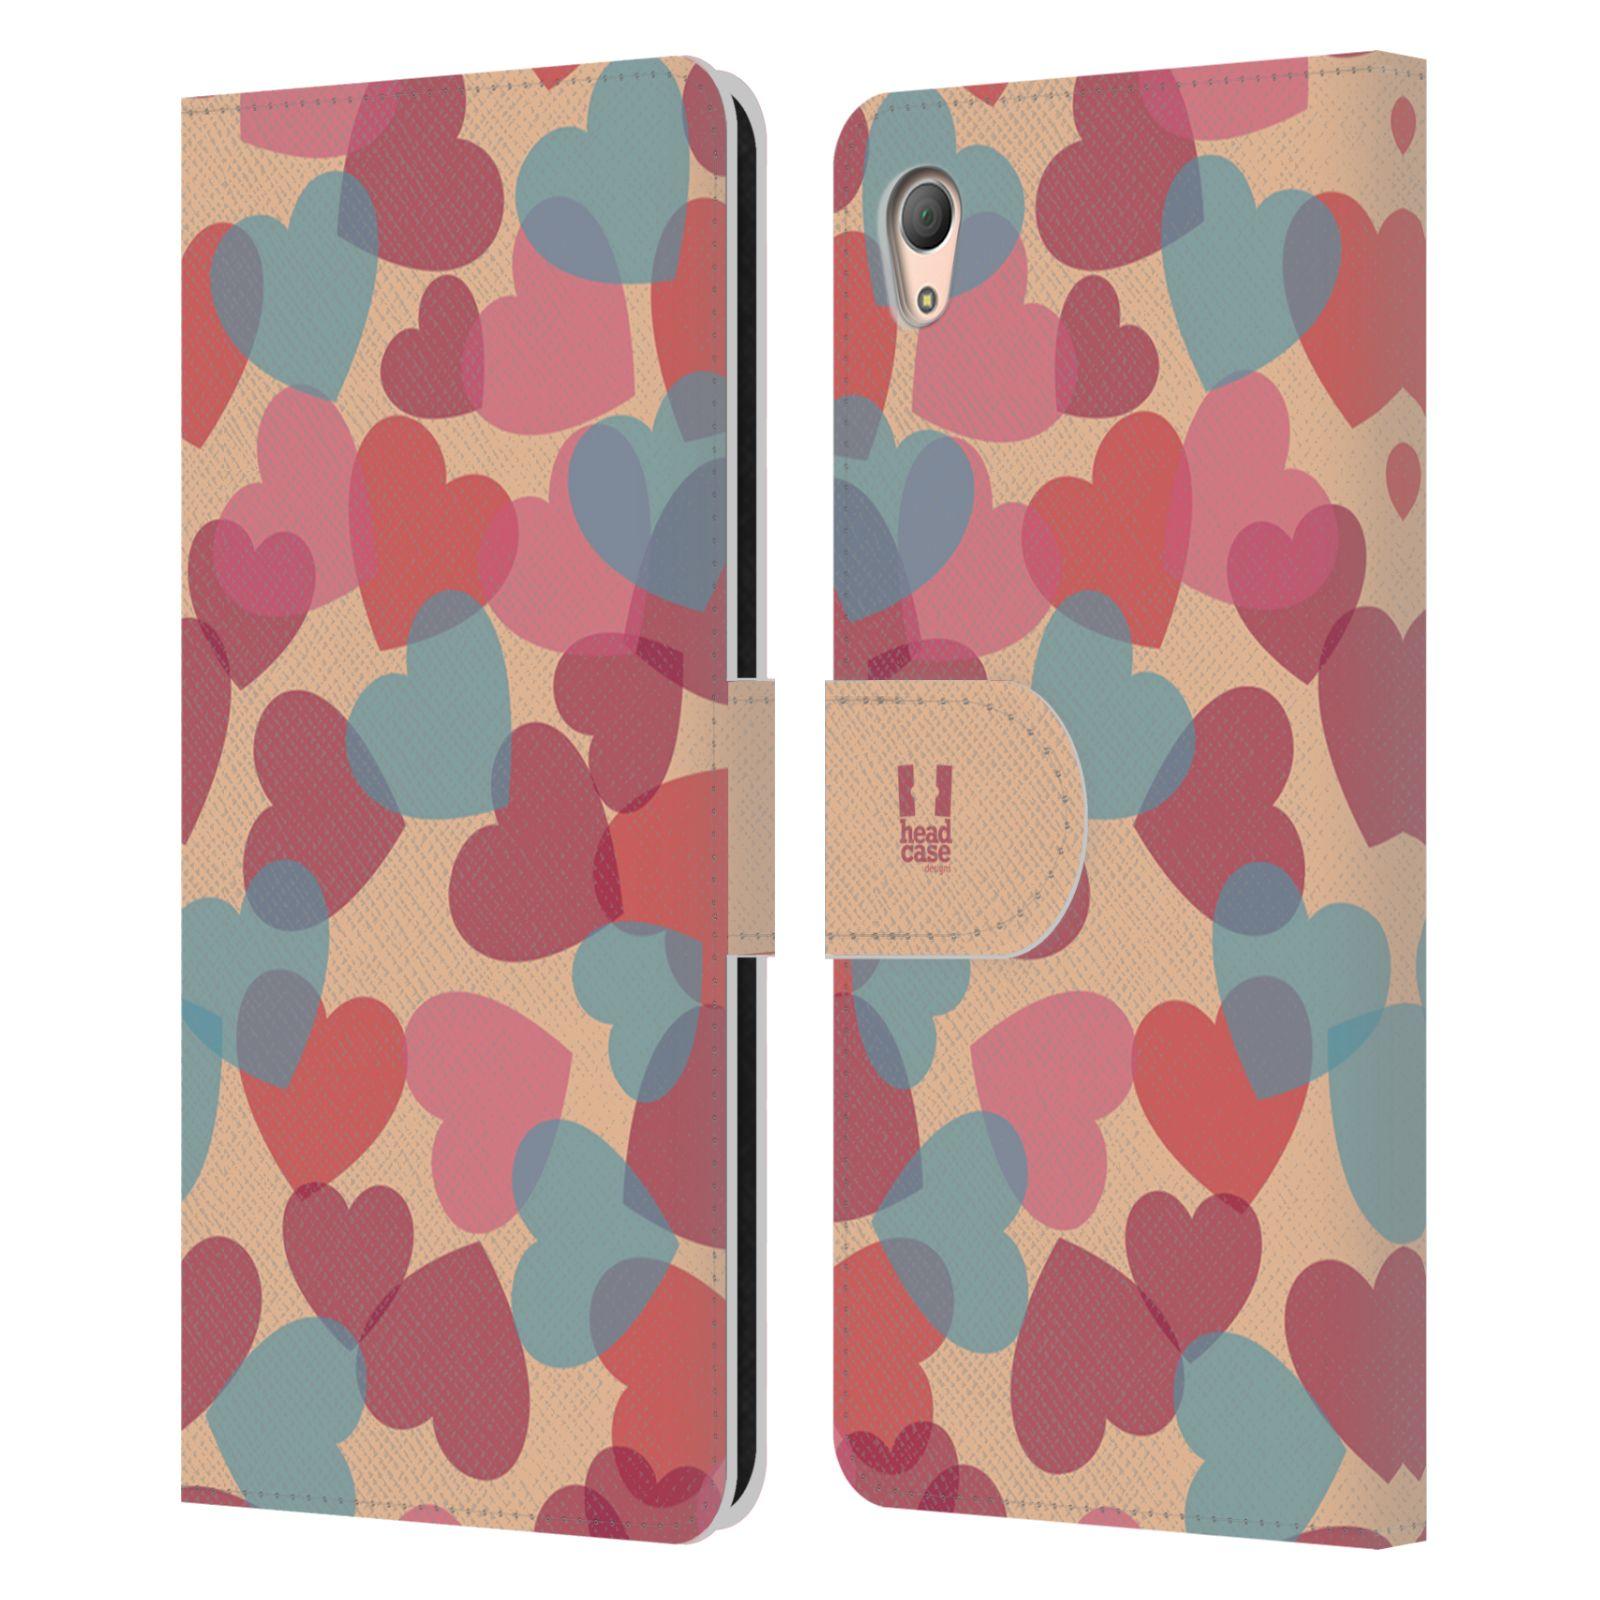 HEAD CASE Flipové pouzdro pro mobil SONY XPERIA Z3+ (PLUS) vzor prolínající se srdíčka, srdce, láska, růžová